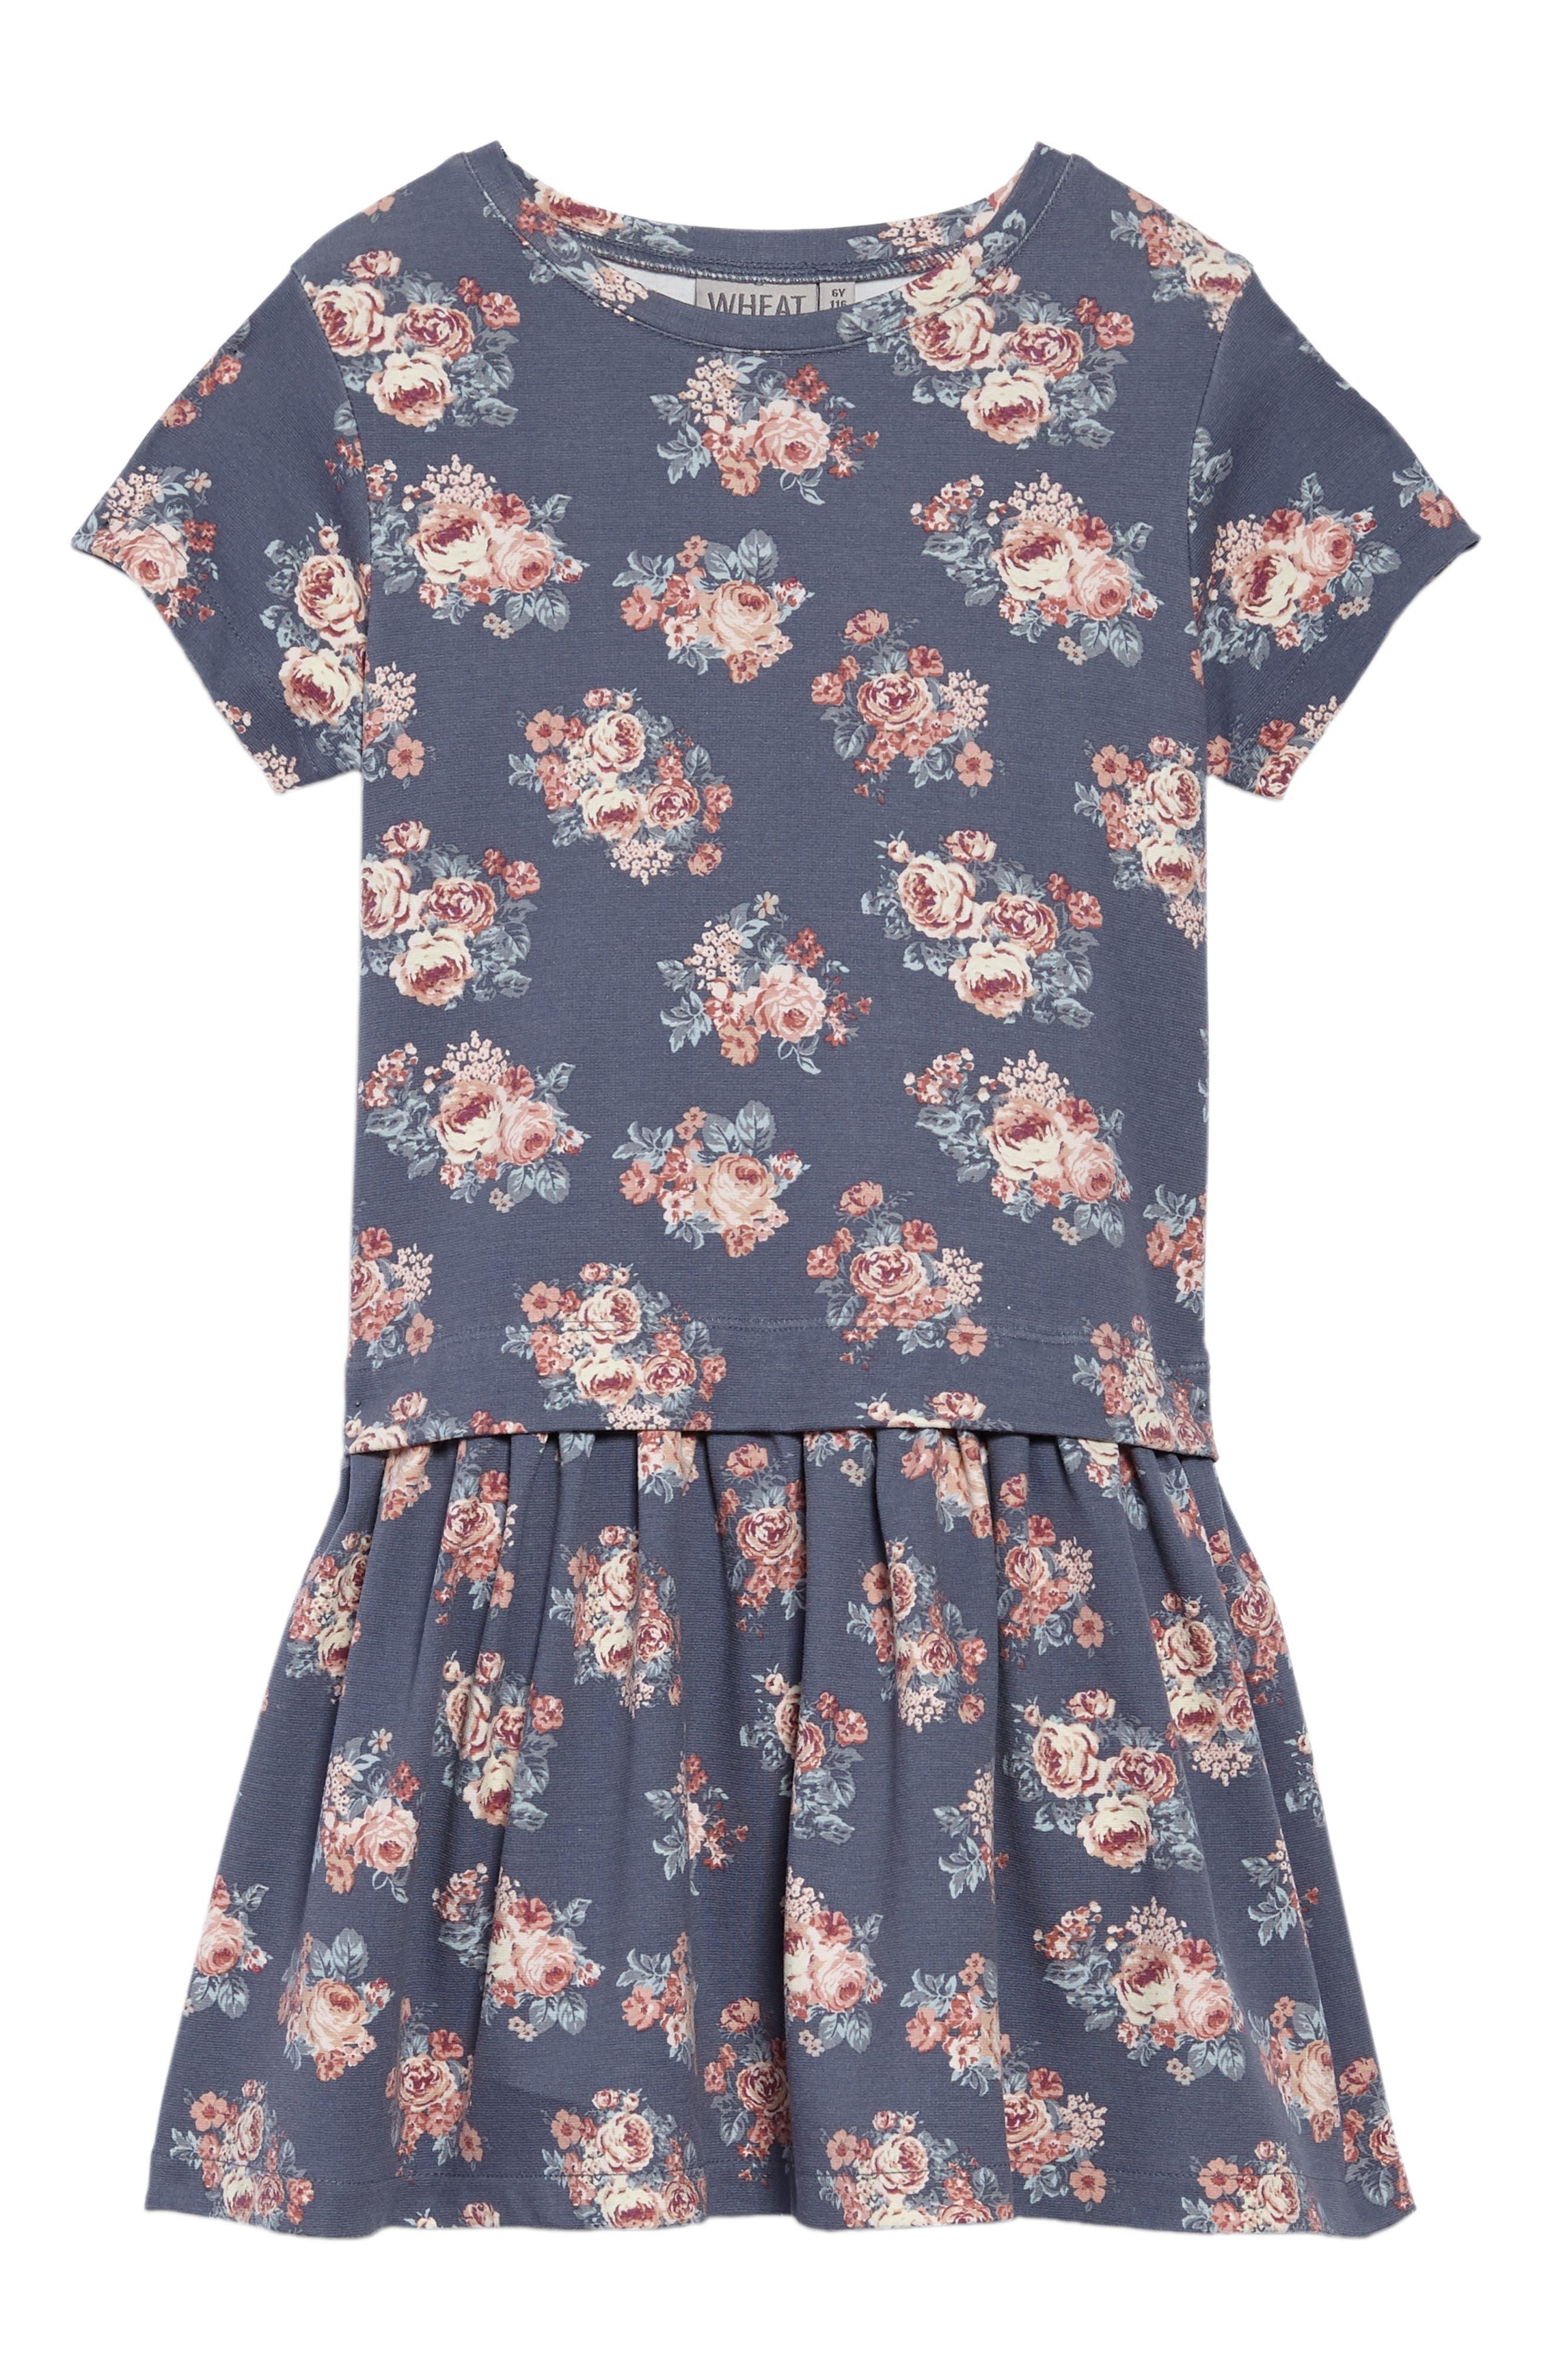 Main Image - Wheat Michella Floral Print Dress (Toddler Girls, Little Girls & Big Girls)